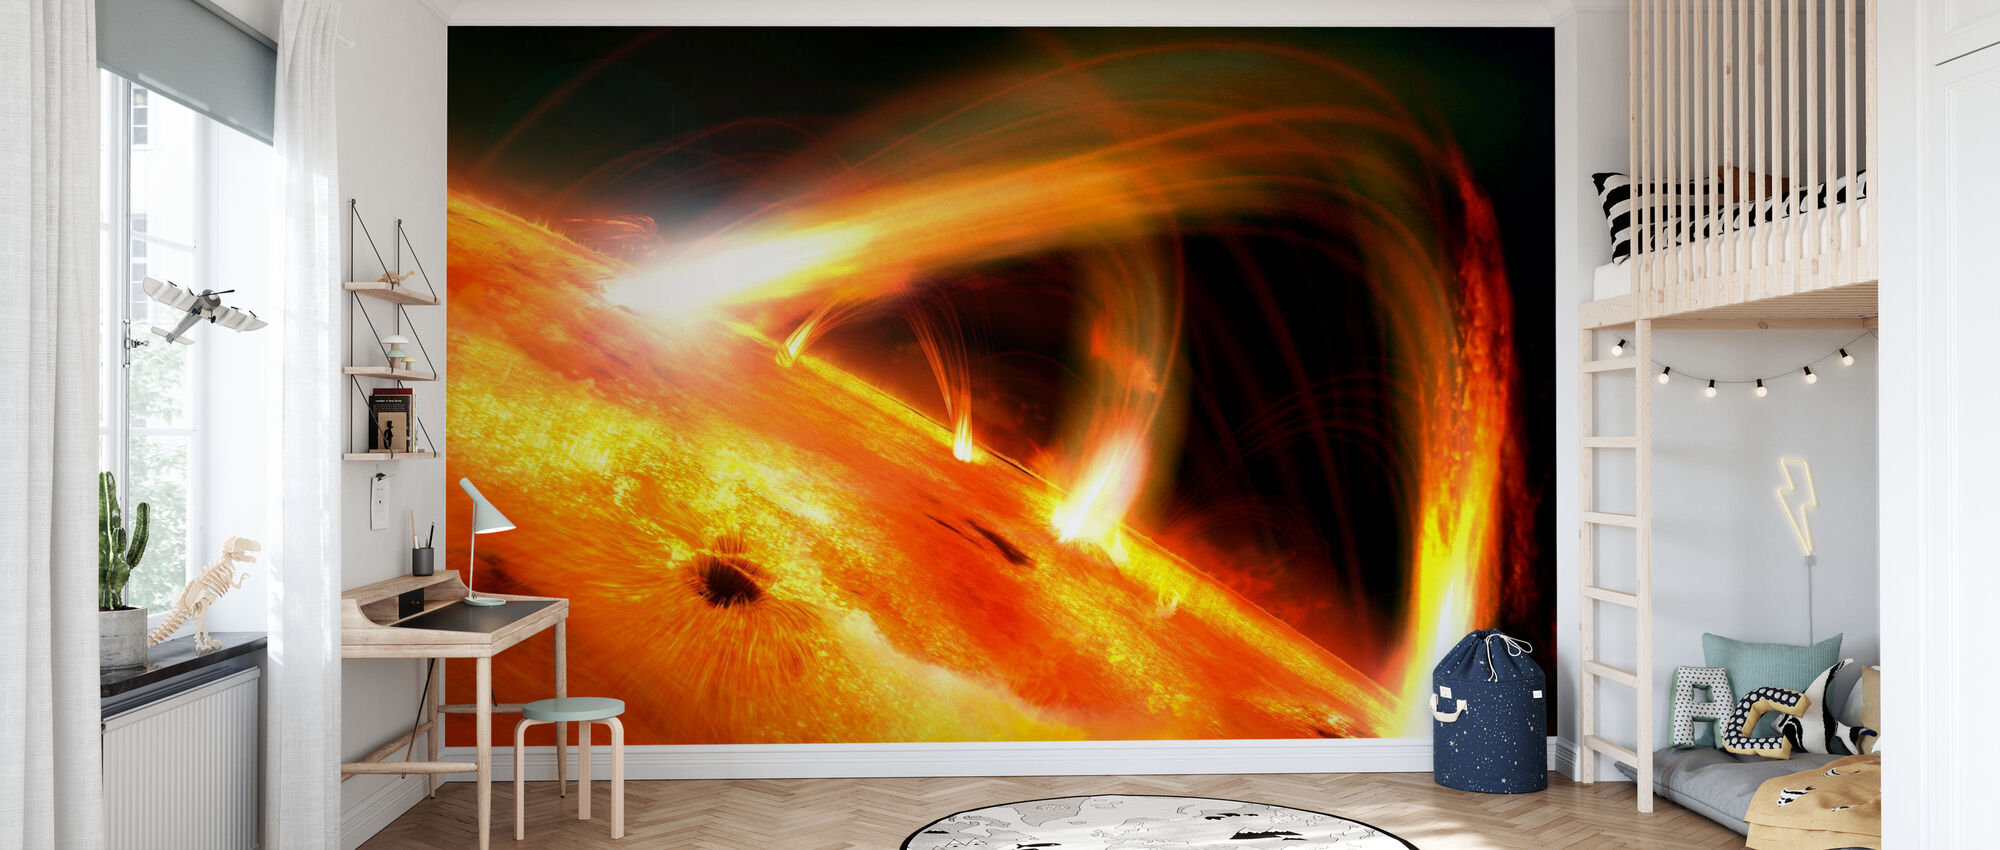 Sun Flares - Wallpaper - Kids Room